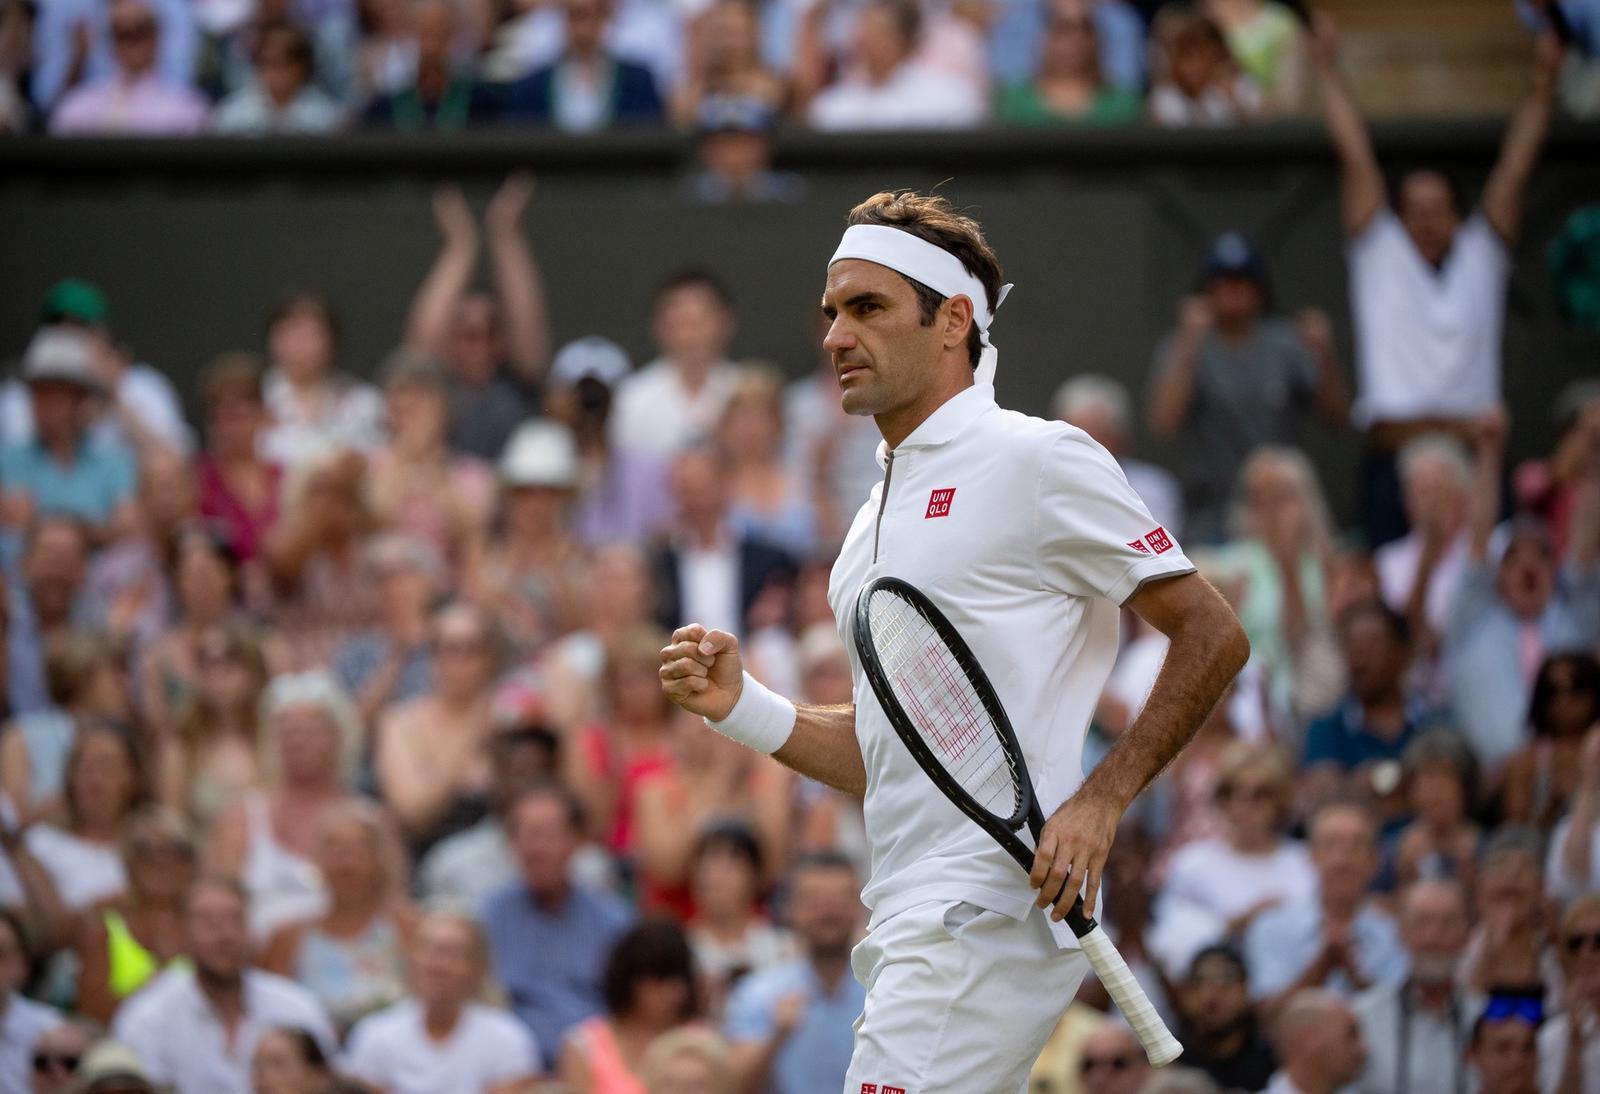 Tennis-Ageless Federer enjoys turning the tables on great foe Nadal